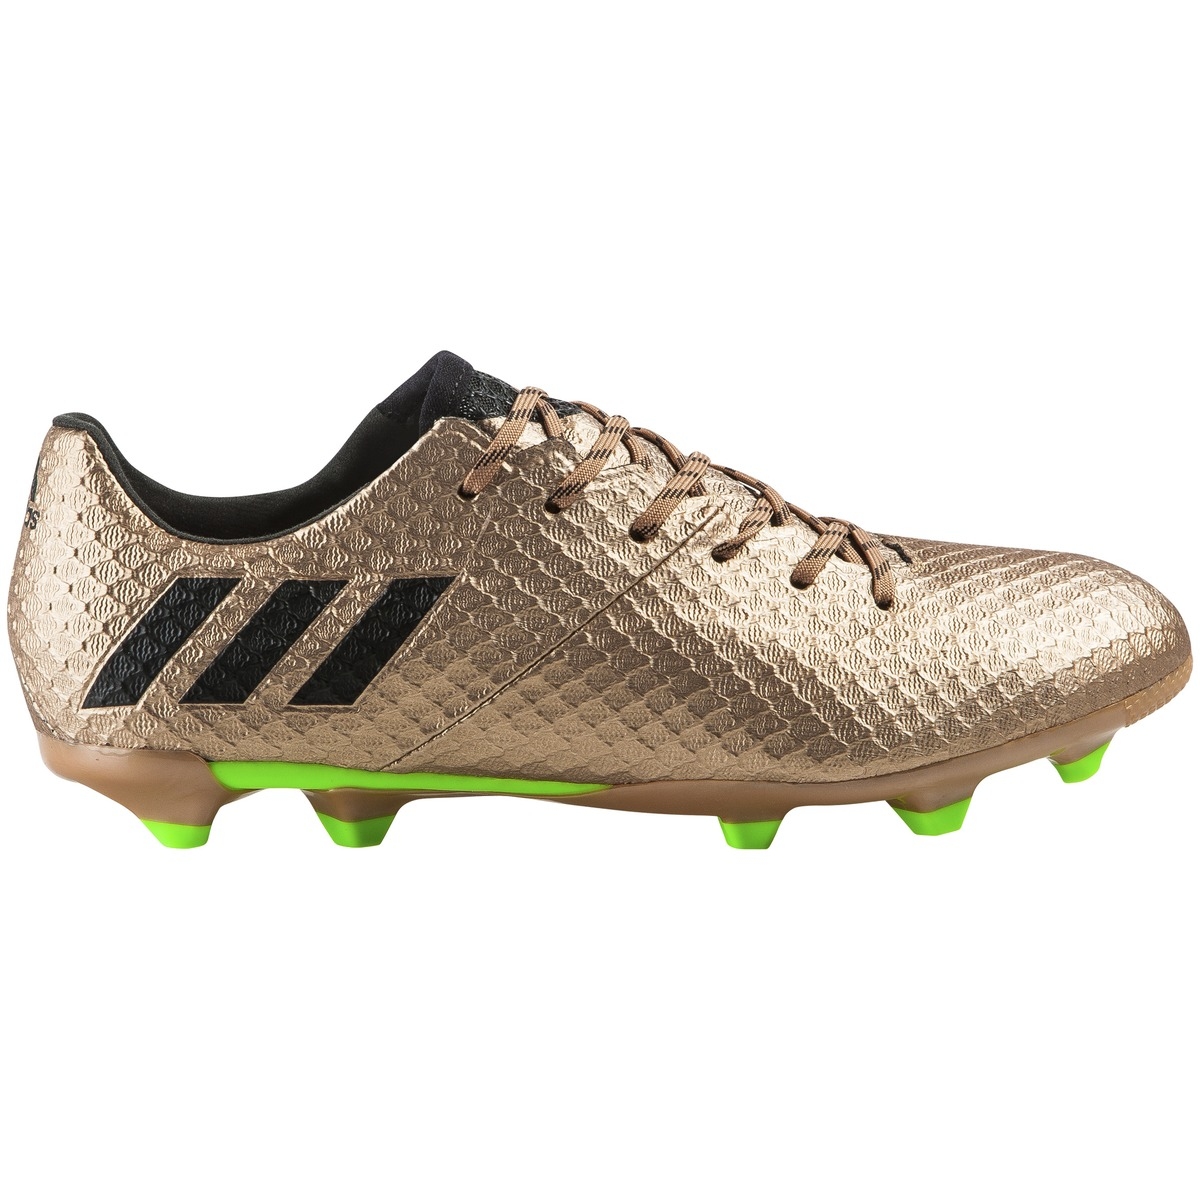 6105de89 Find adidas ace 16.1 fg leather fotballsko gul no. Shop every store ...